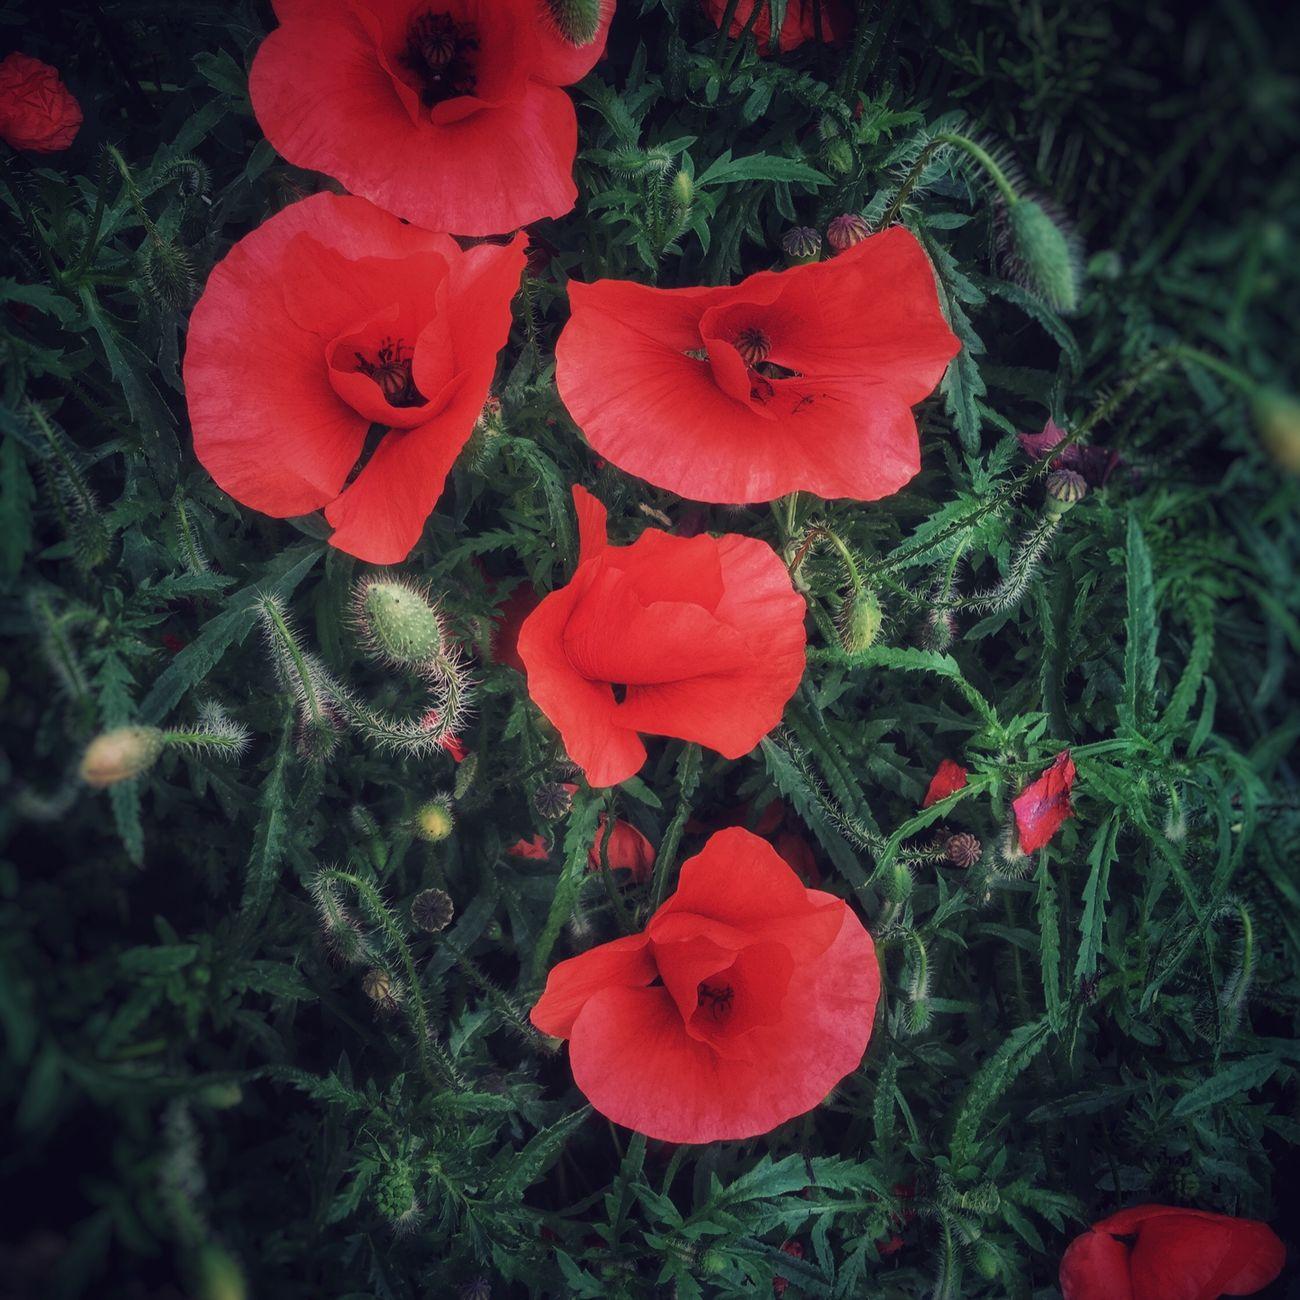 Poppy Poppy Flowers Poppy Poppies  Naturelovers Nature Flowers Summer Colors